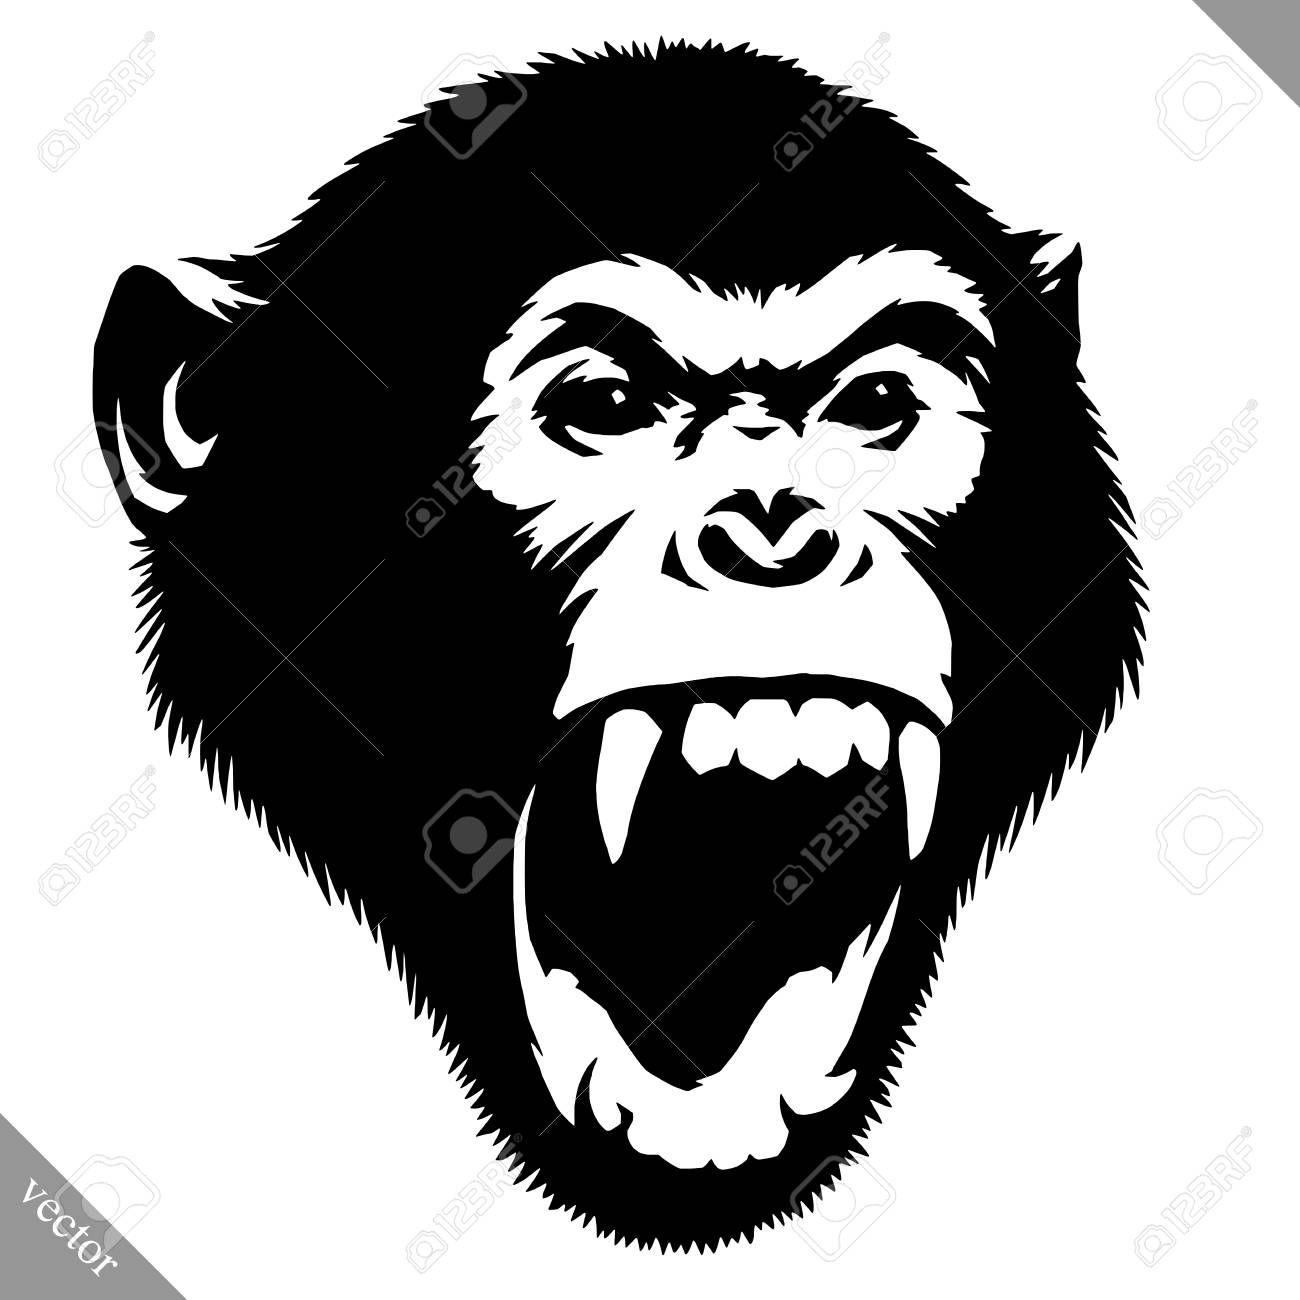 Stock Vector Monkey illustration, Vector illustration